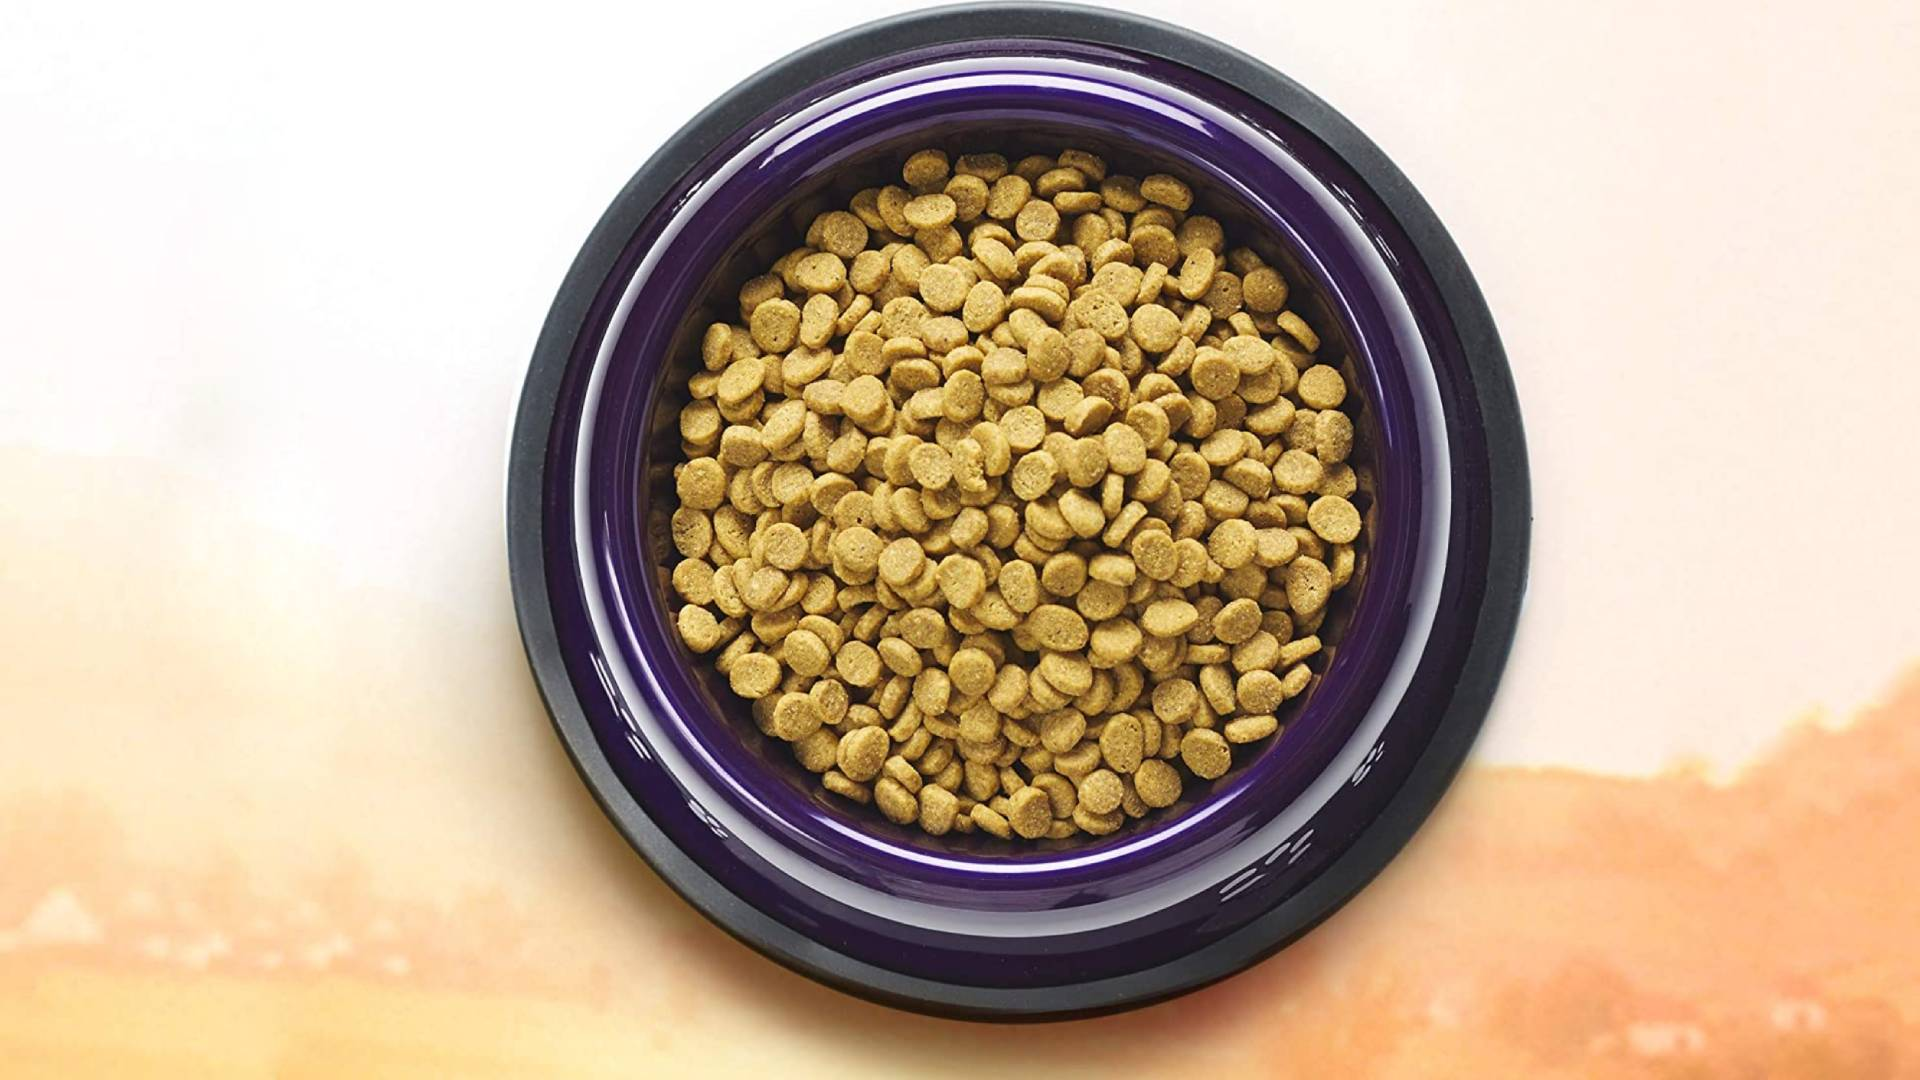 comida para gatos halo